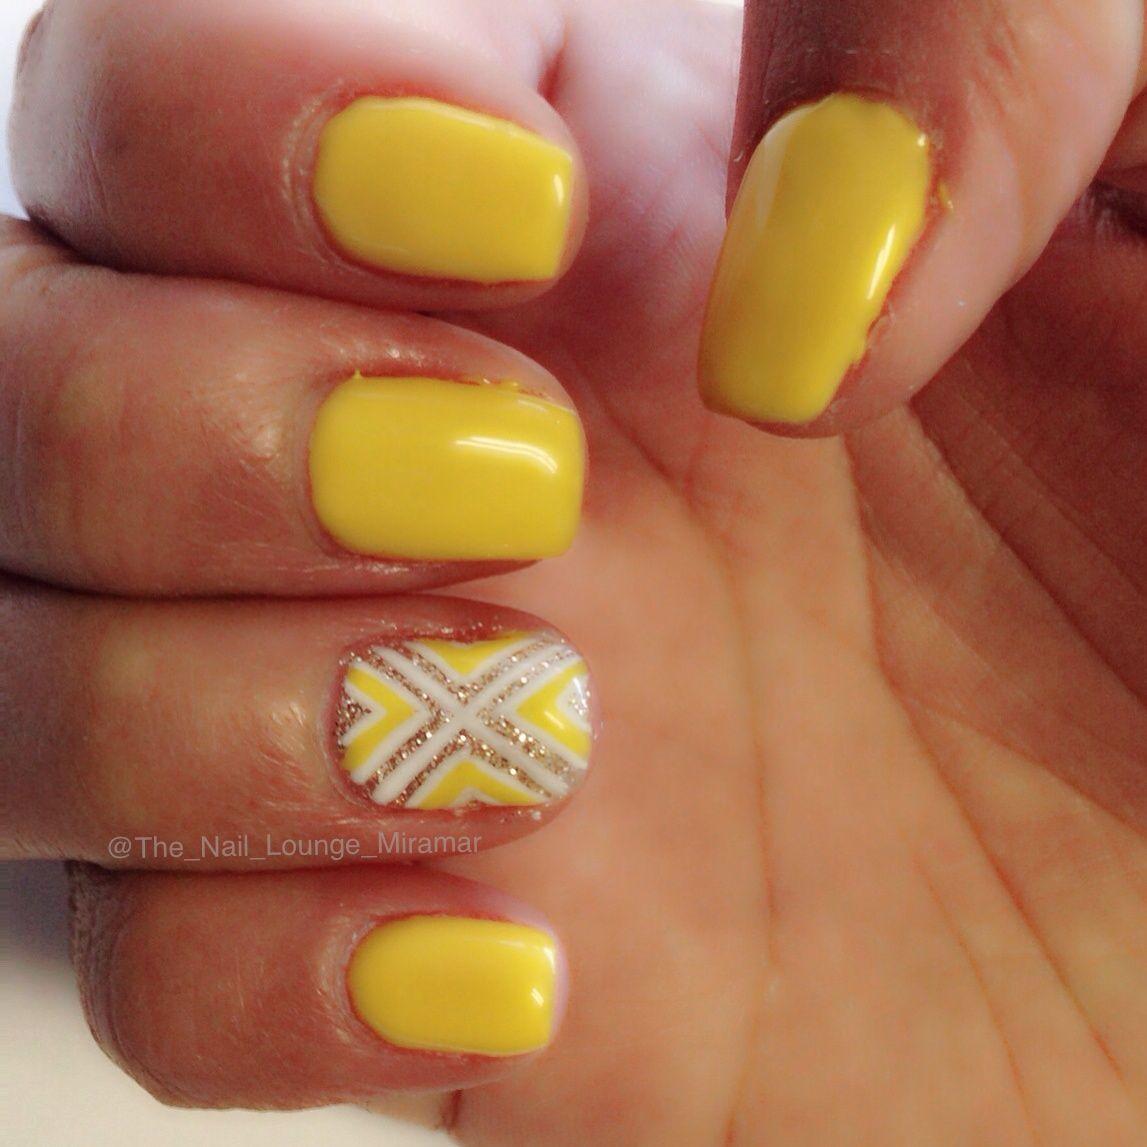 Pin By The Nail Lounge On Nail Art Yellow Nails Yellow Nail Art Yellow Nails Design